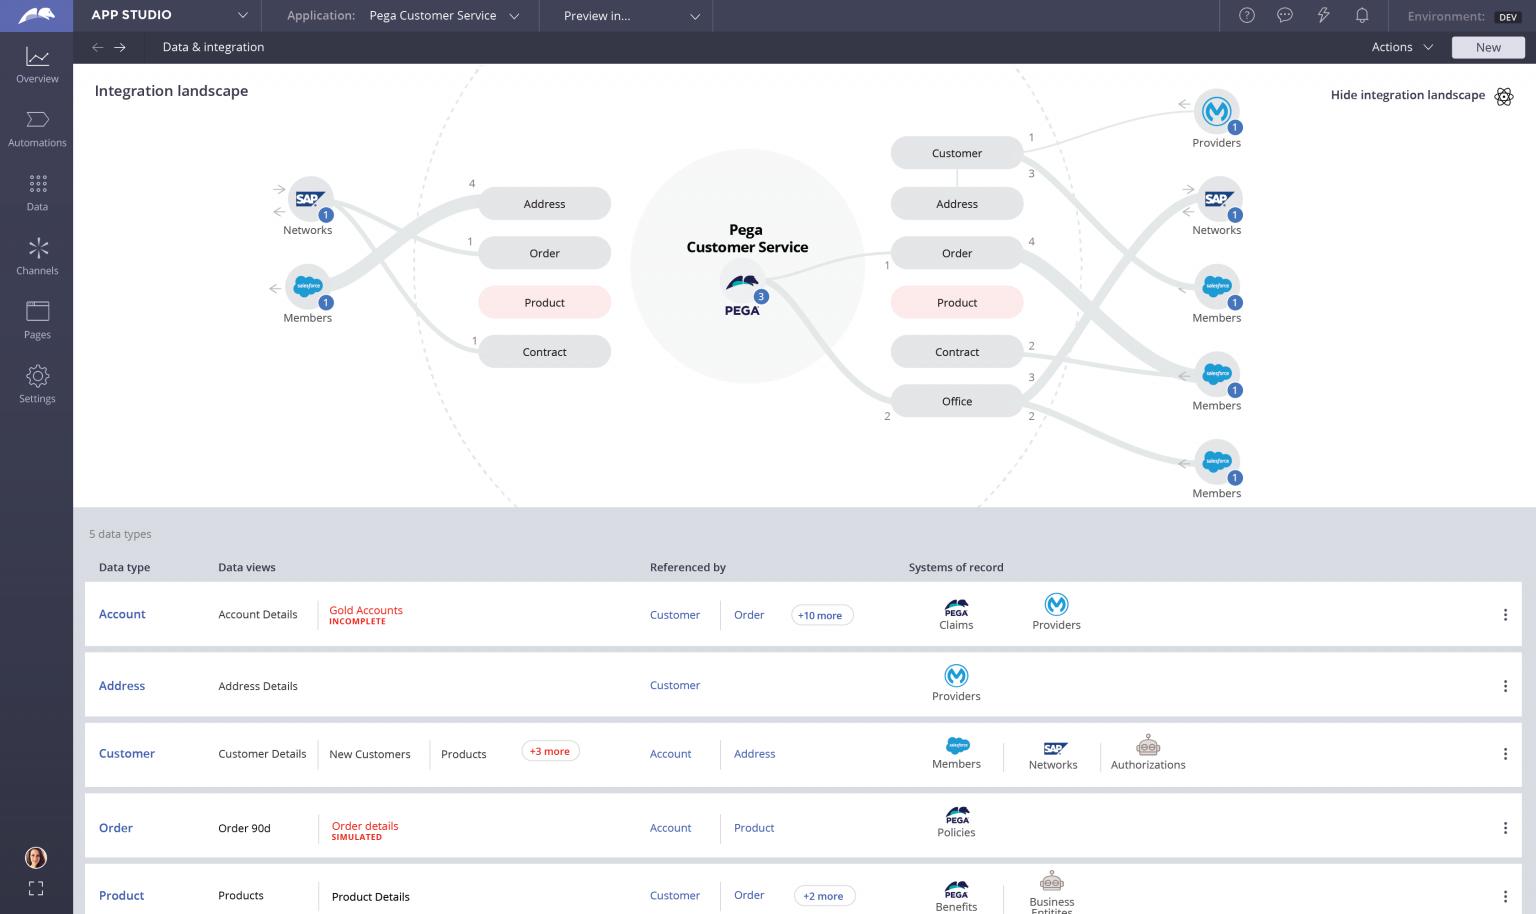 pega platform workflow ss 1536x914 1 - Workplace Innovation Platforms: The 2021 Guide